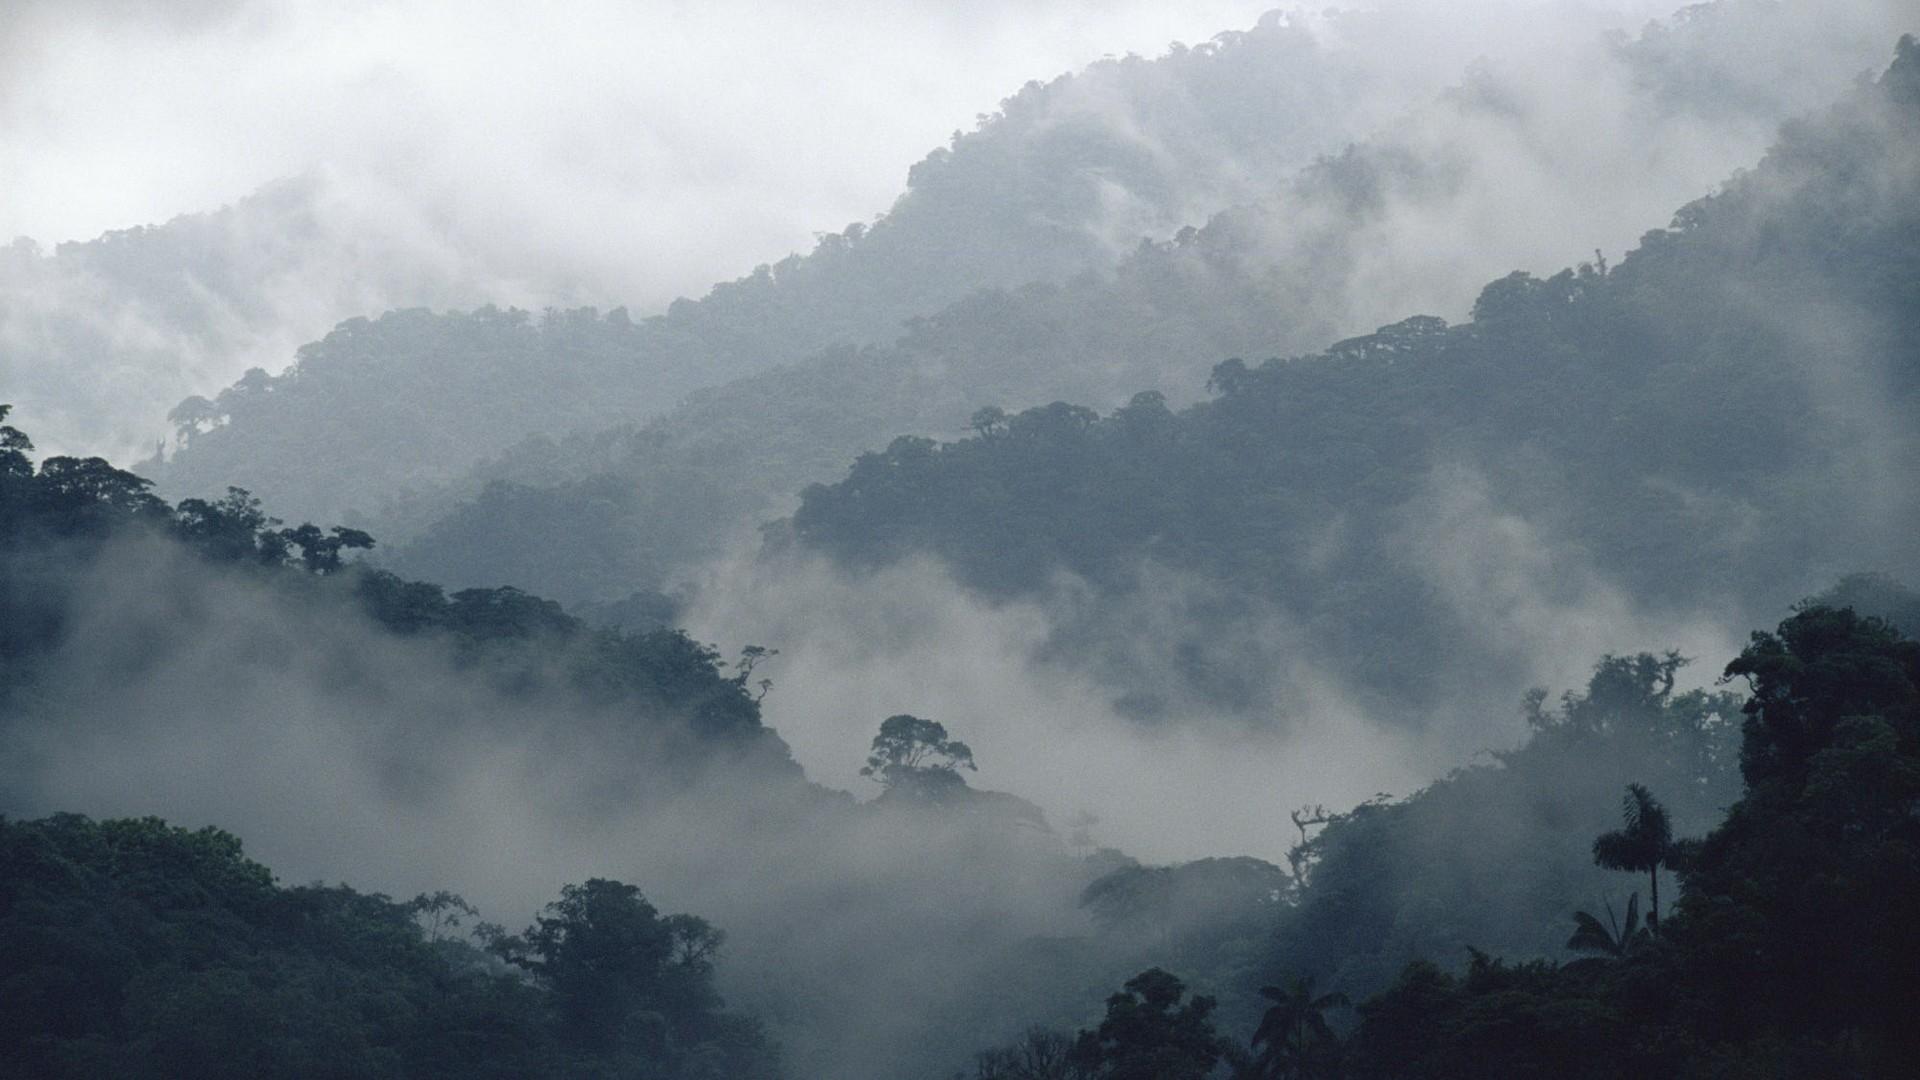 Fantastic Wallpaper Mountain Fog - ff3e1eb8fa110ae7386723e2f36c0ddb3adef2a1  Snapshot_42754.jpg